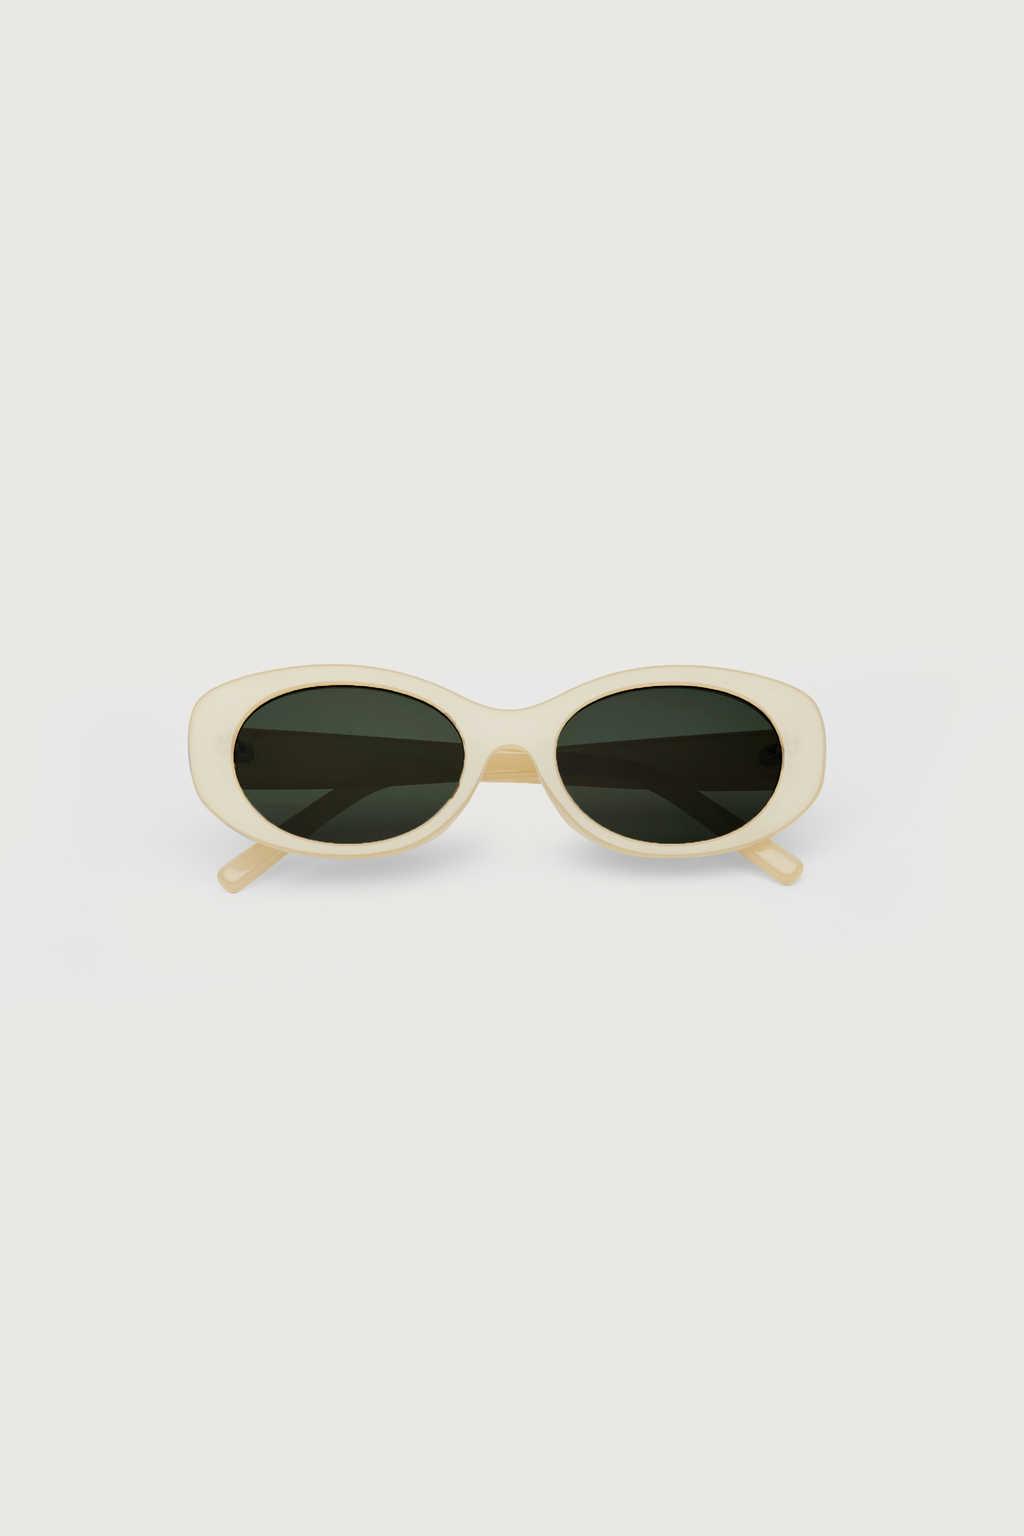 Sunglass 3367 Cream 1